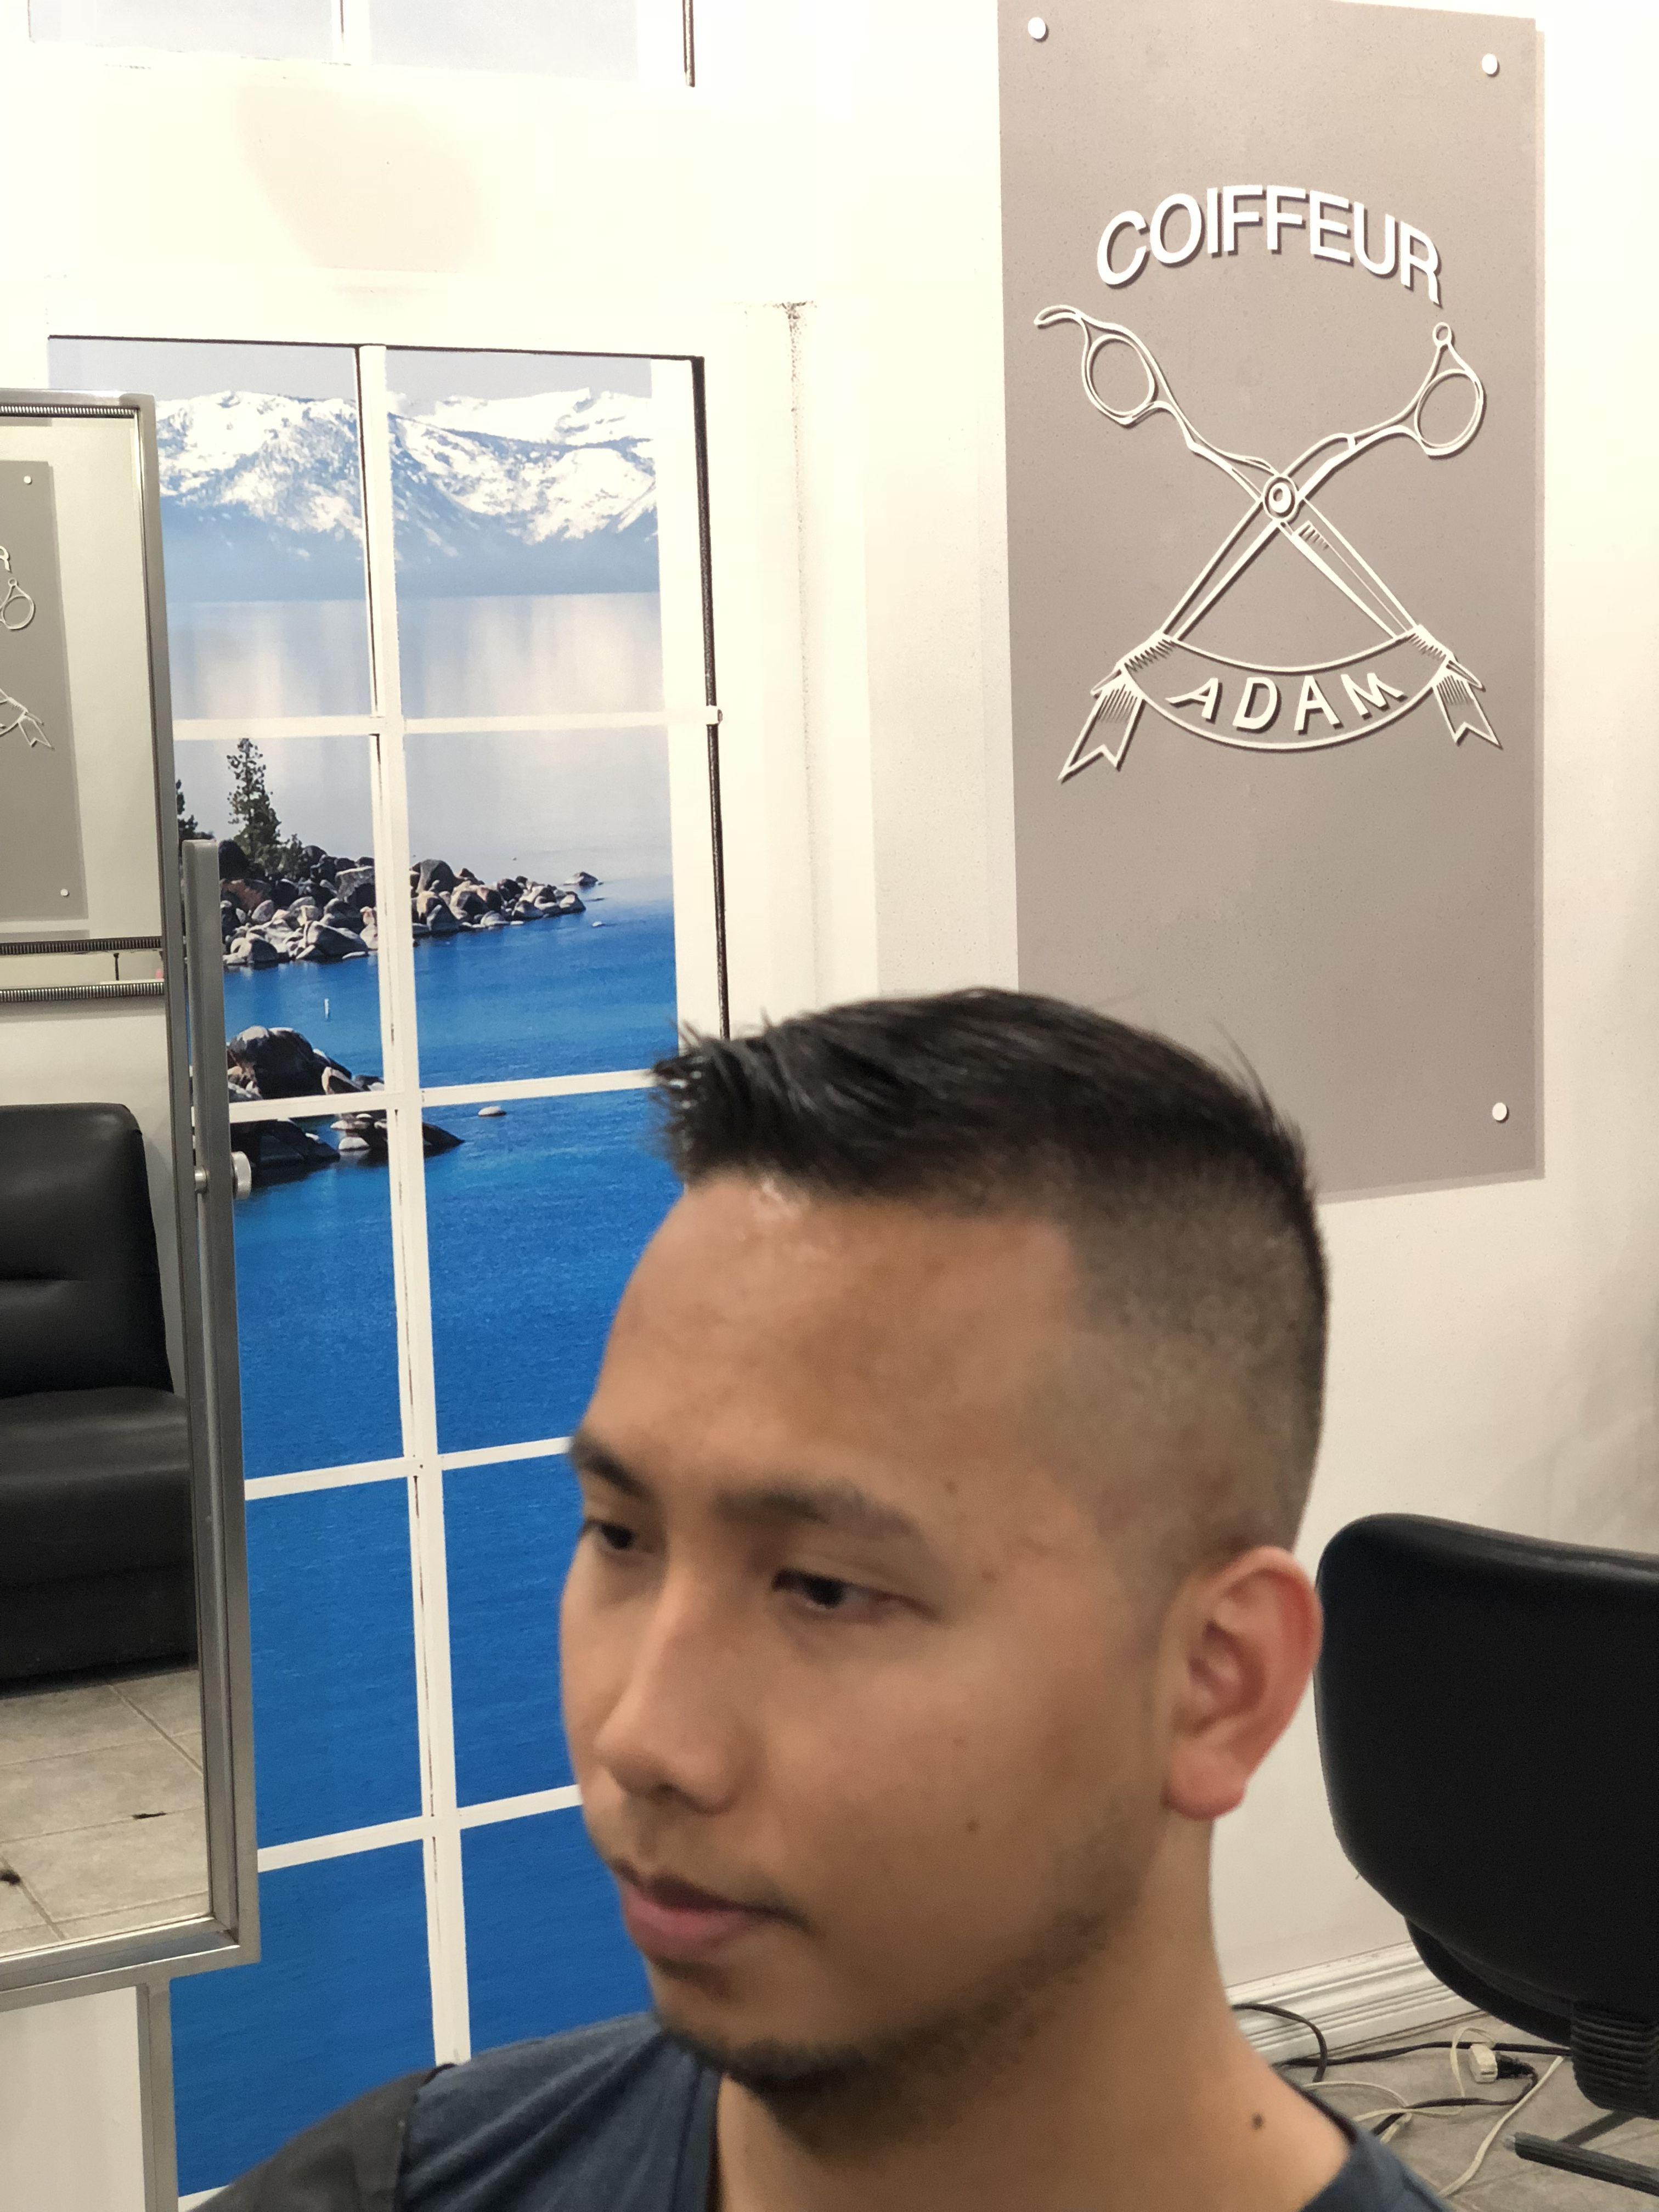 Coiffeuradam coiffeur adam u at coiffeur adam